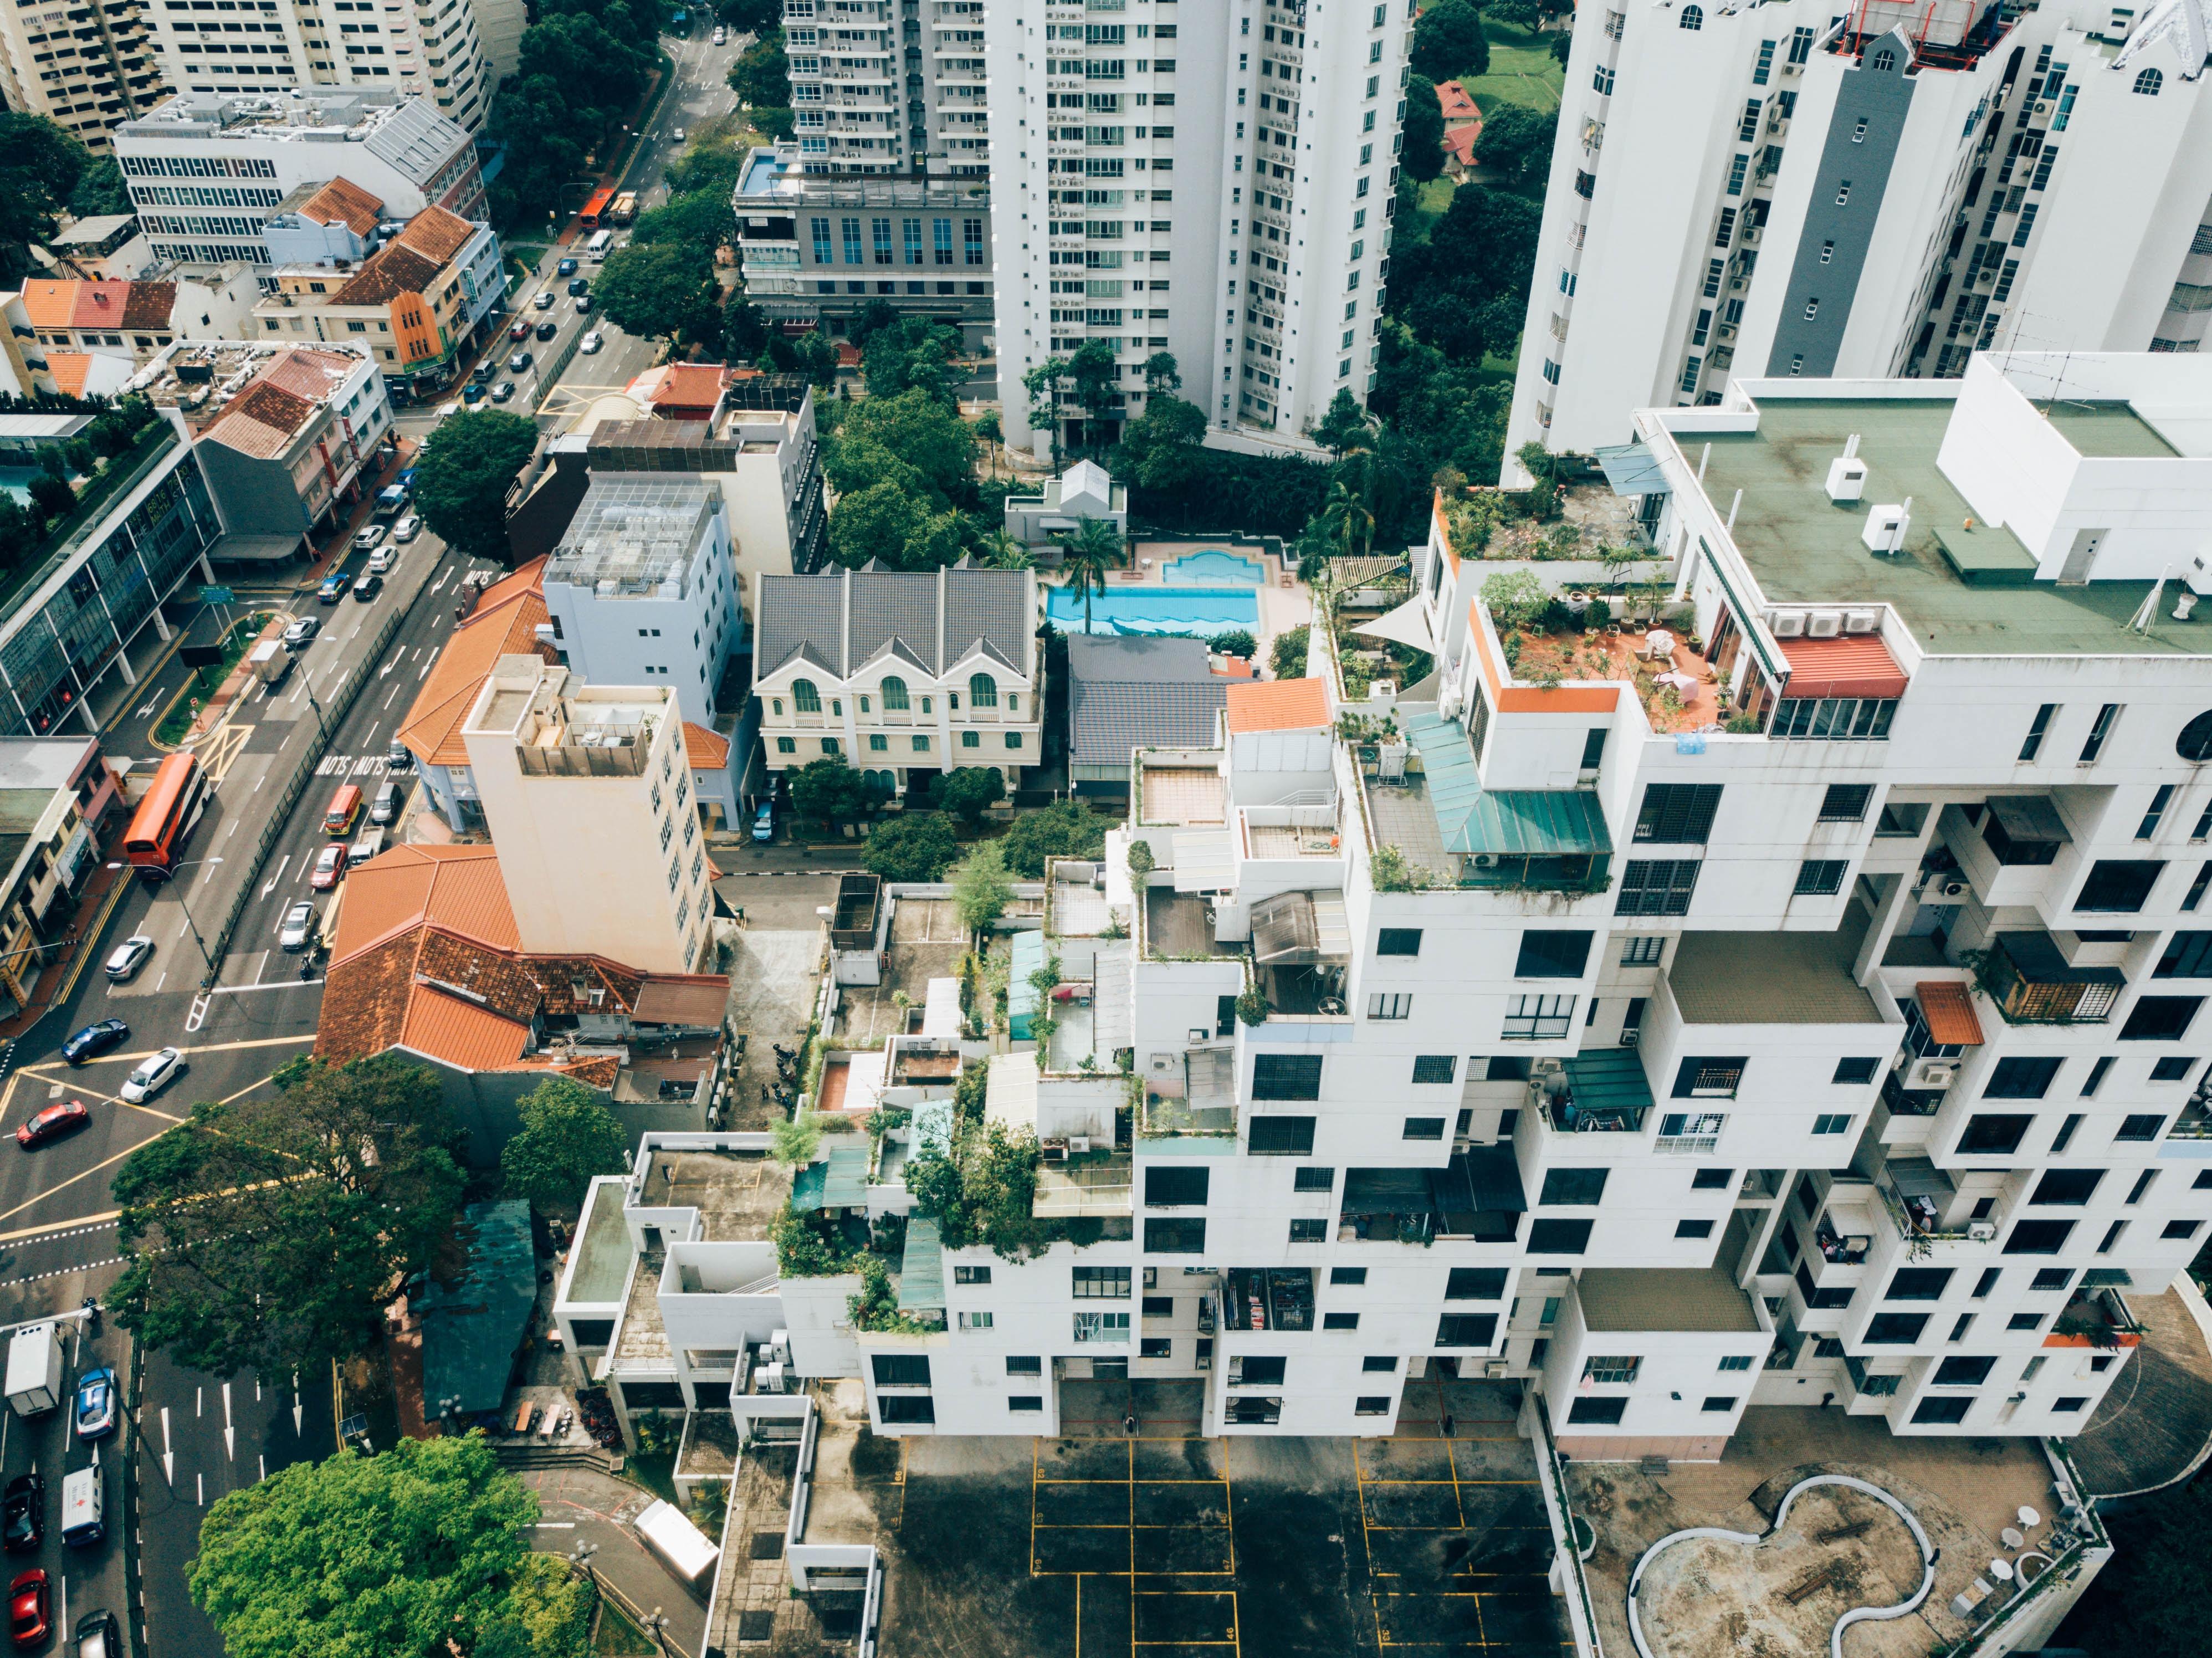 aerial photo of white concrete buildings